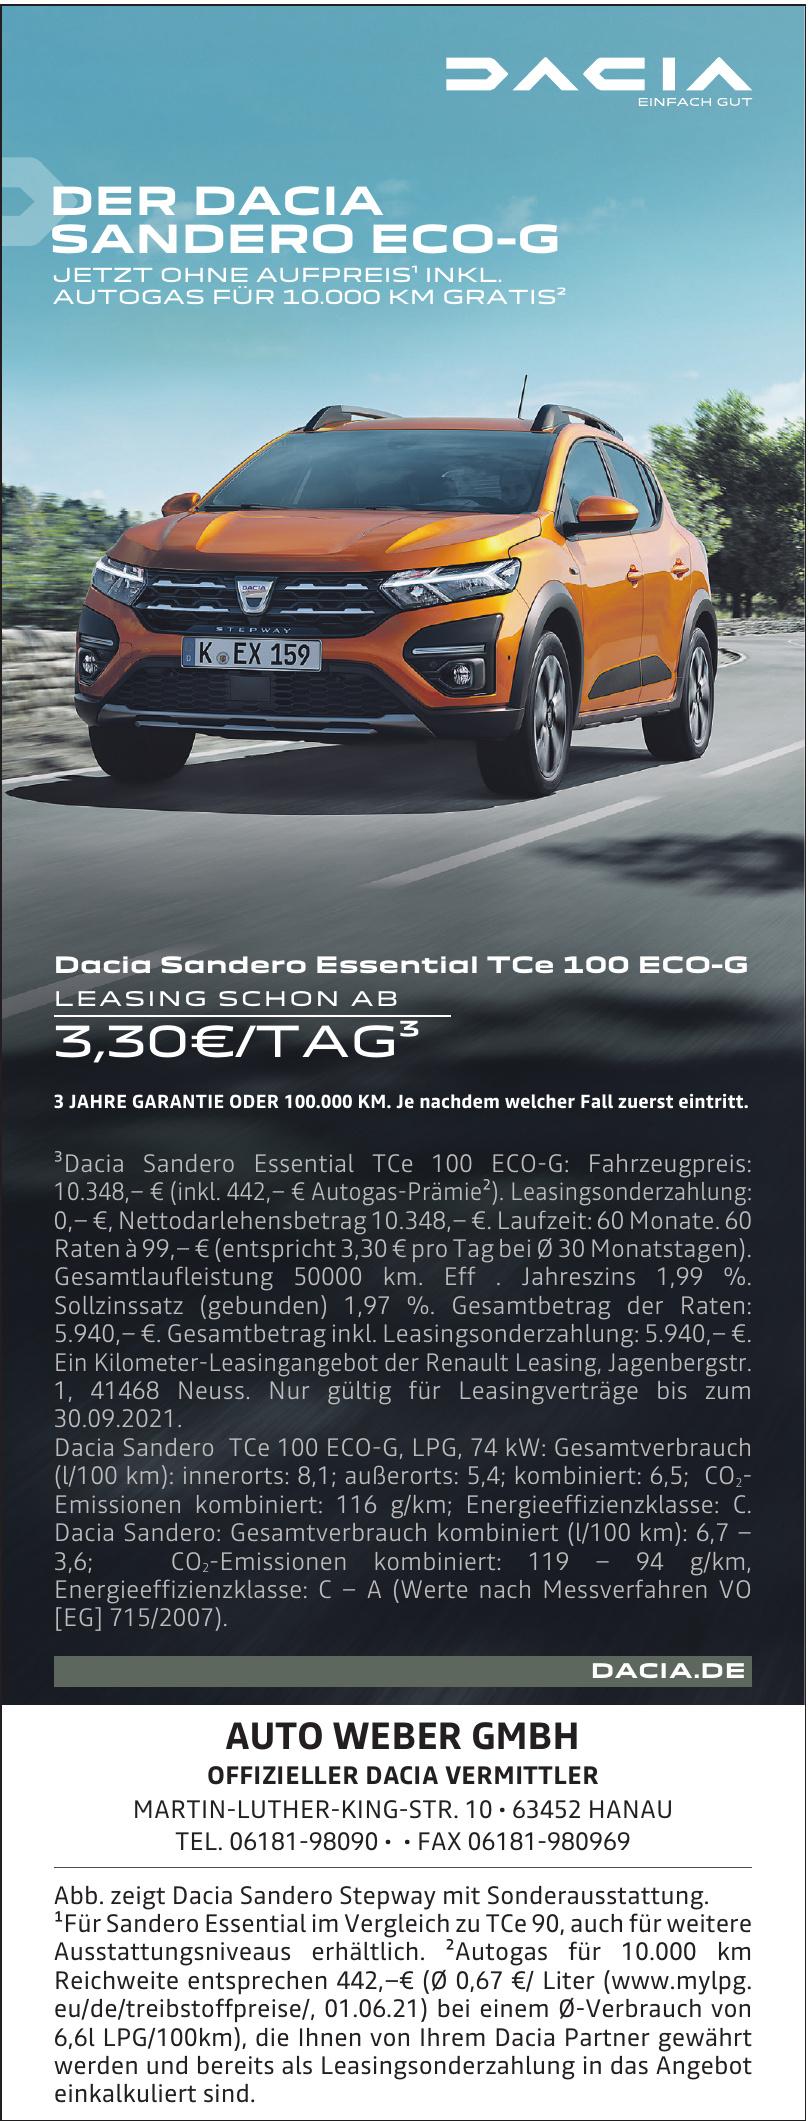 Auto Weber GmbH